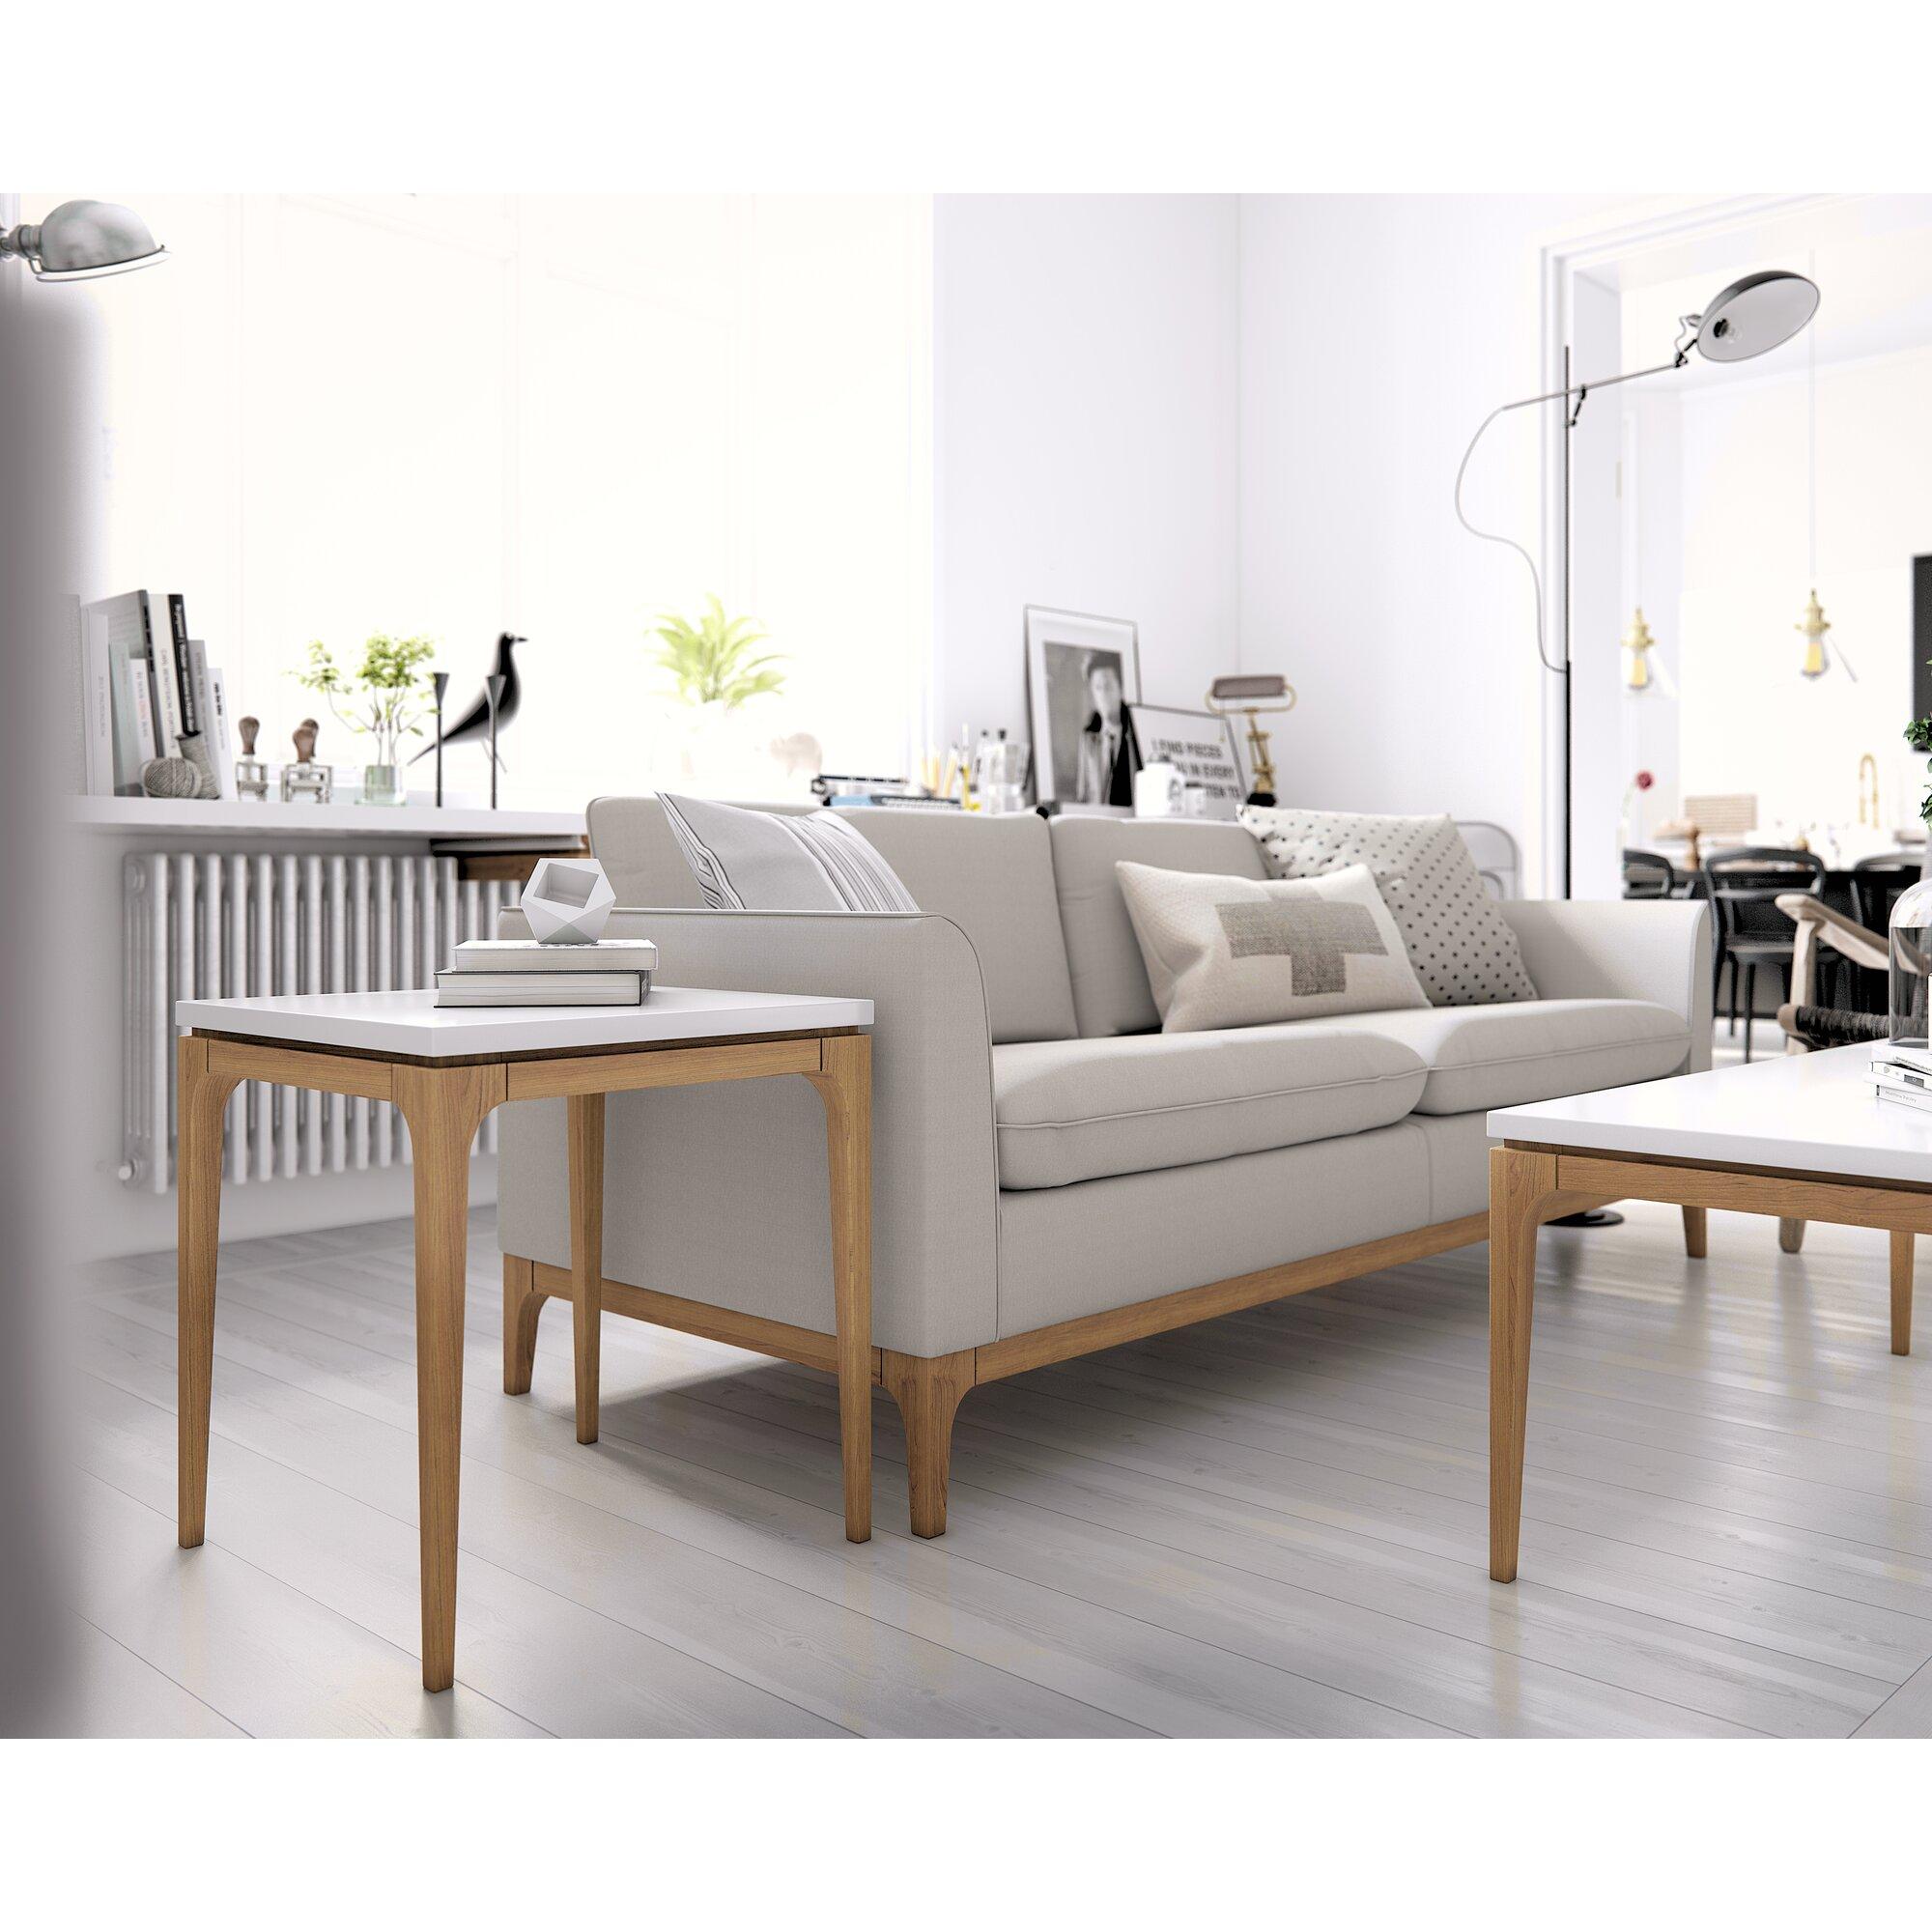 byrd sofa Sofa Hpricot